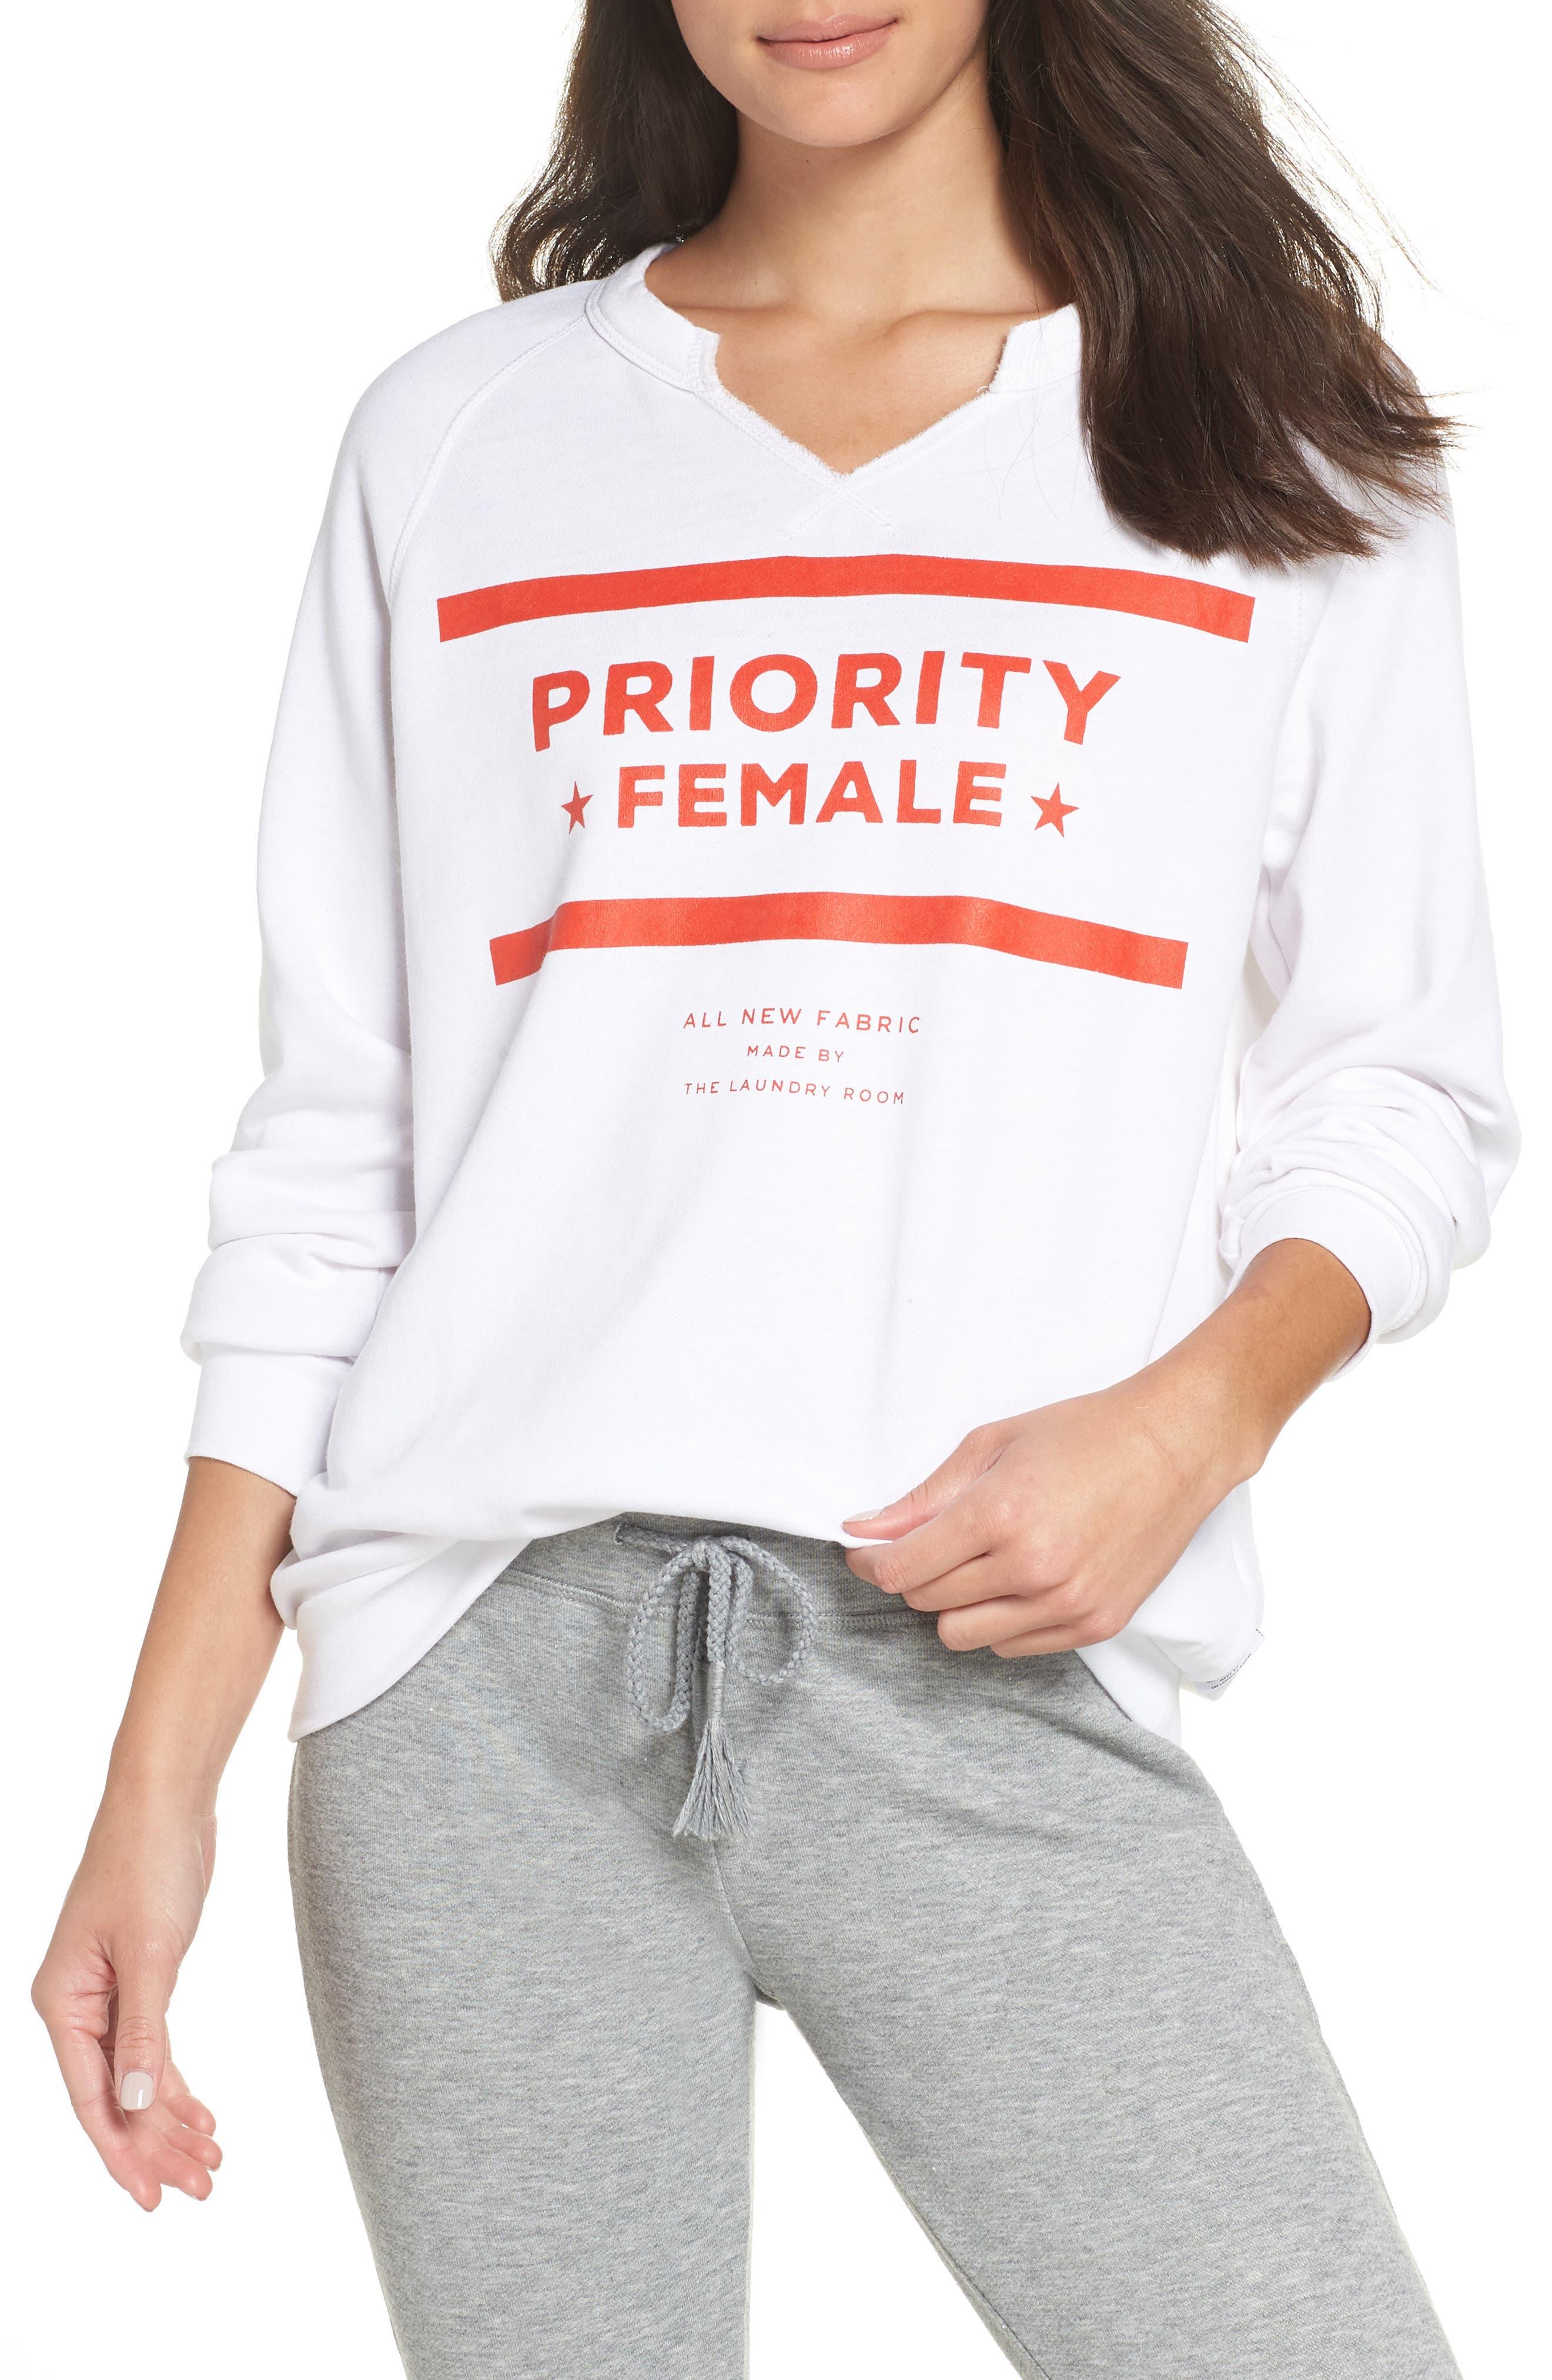 Priority Female Sweatshirt,                             Main thumbnail 1, color,                             WHITE